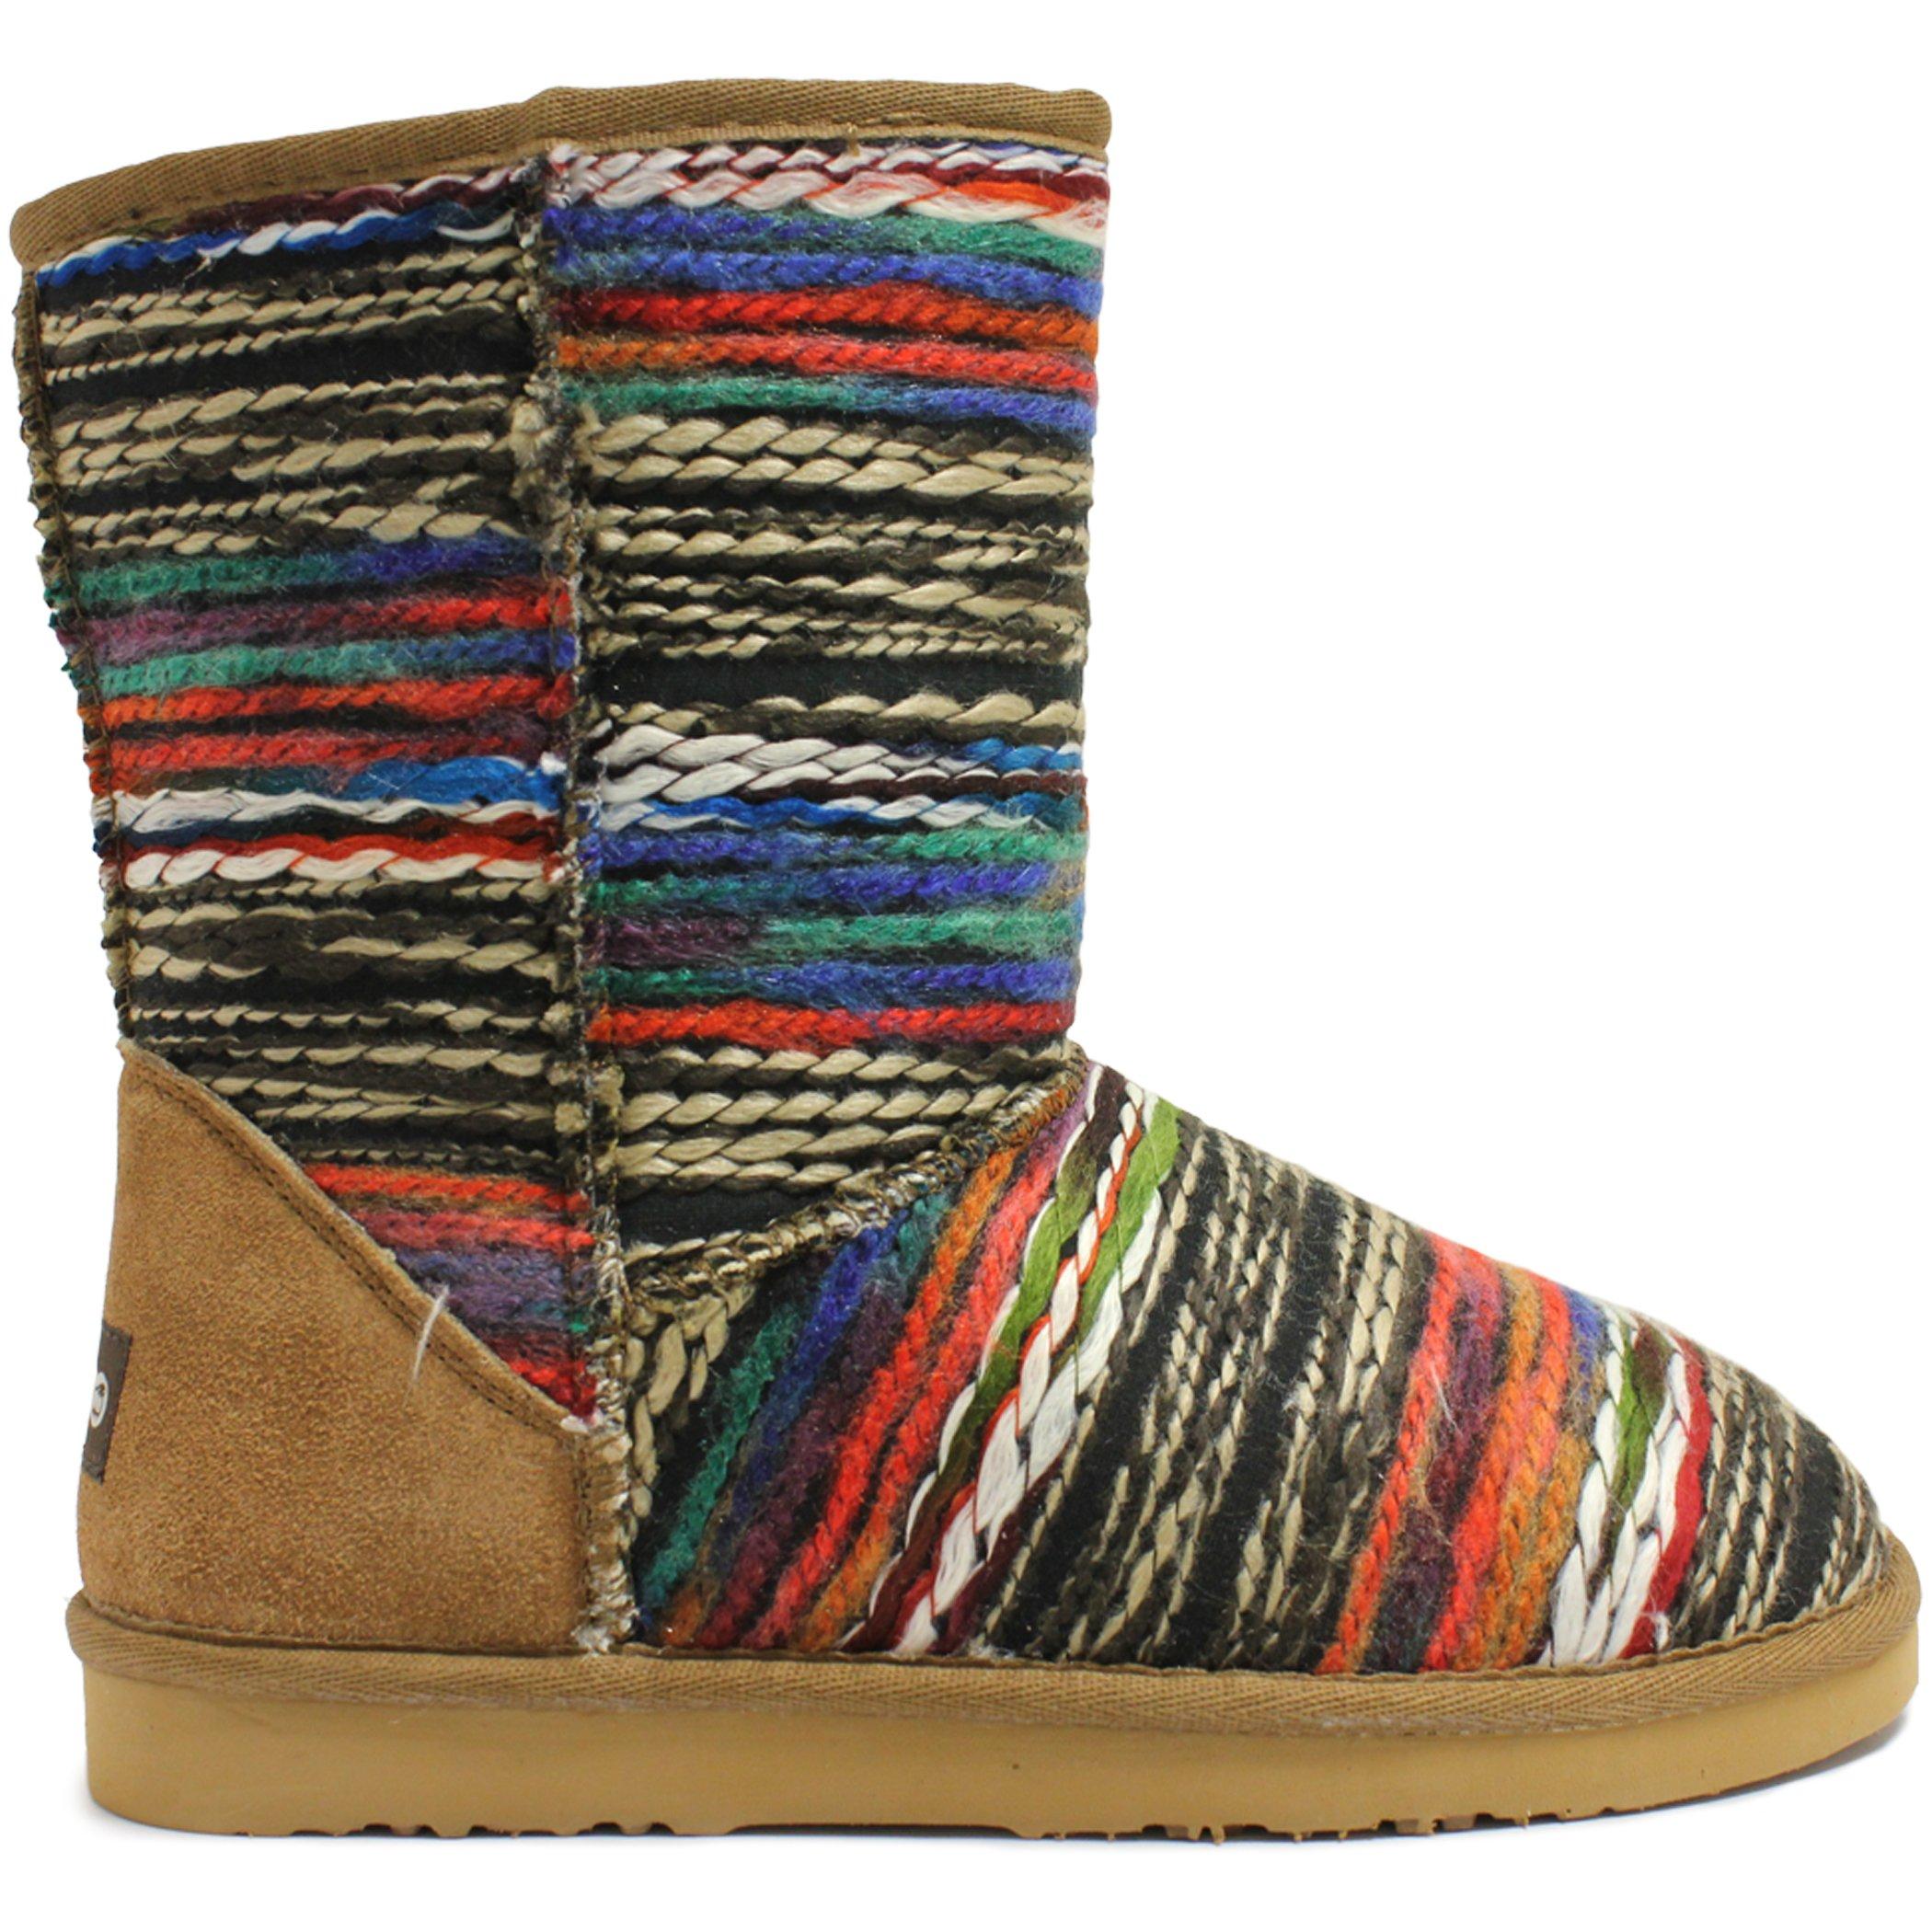 Lamo Women's Julep 10 inch Chelsea Boot, Chestnut, 9 M US